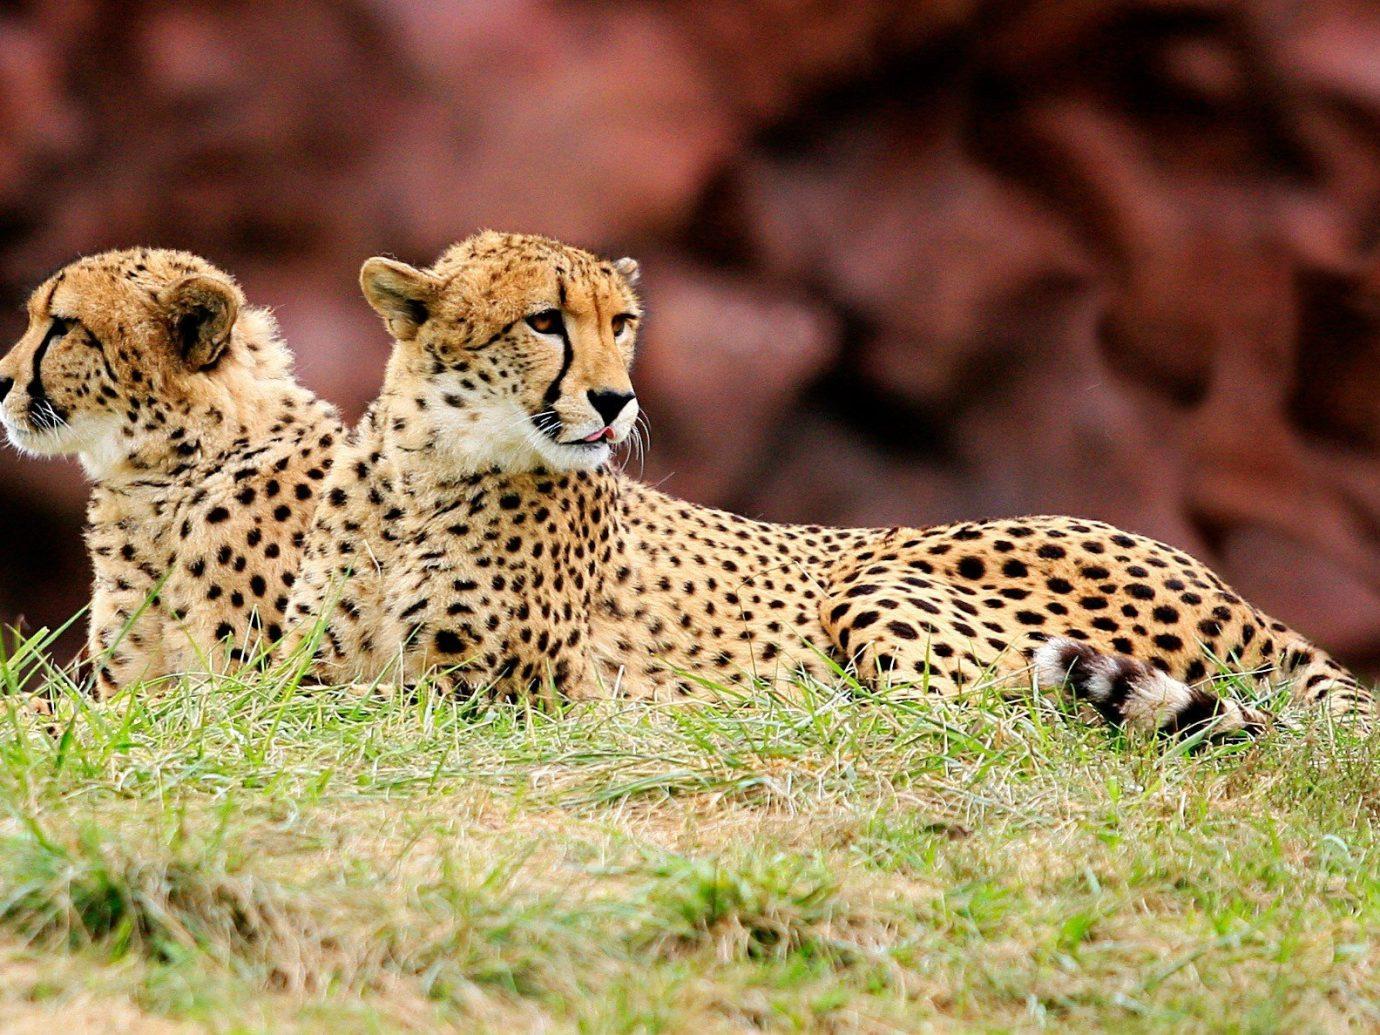 Jetsetter Guides grass animal mammal cheetah big cat outdoor vertebrate Wildlife fauna leopard cat like mammal savanna Safari small to medium sized cats